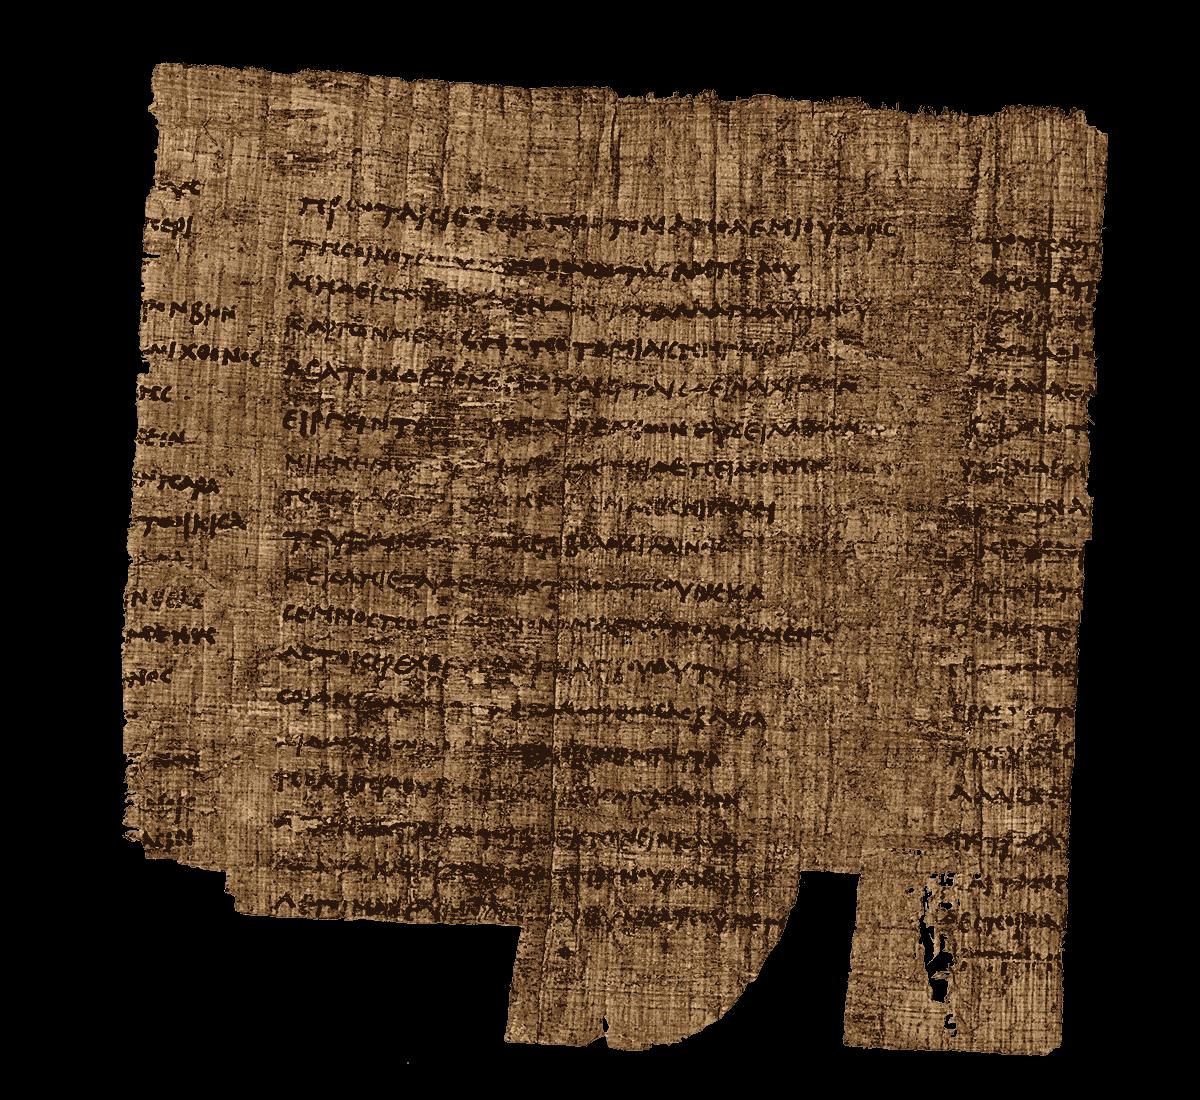 Древний папирус картинки